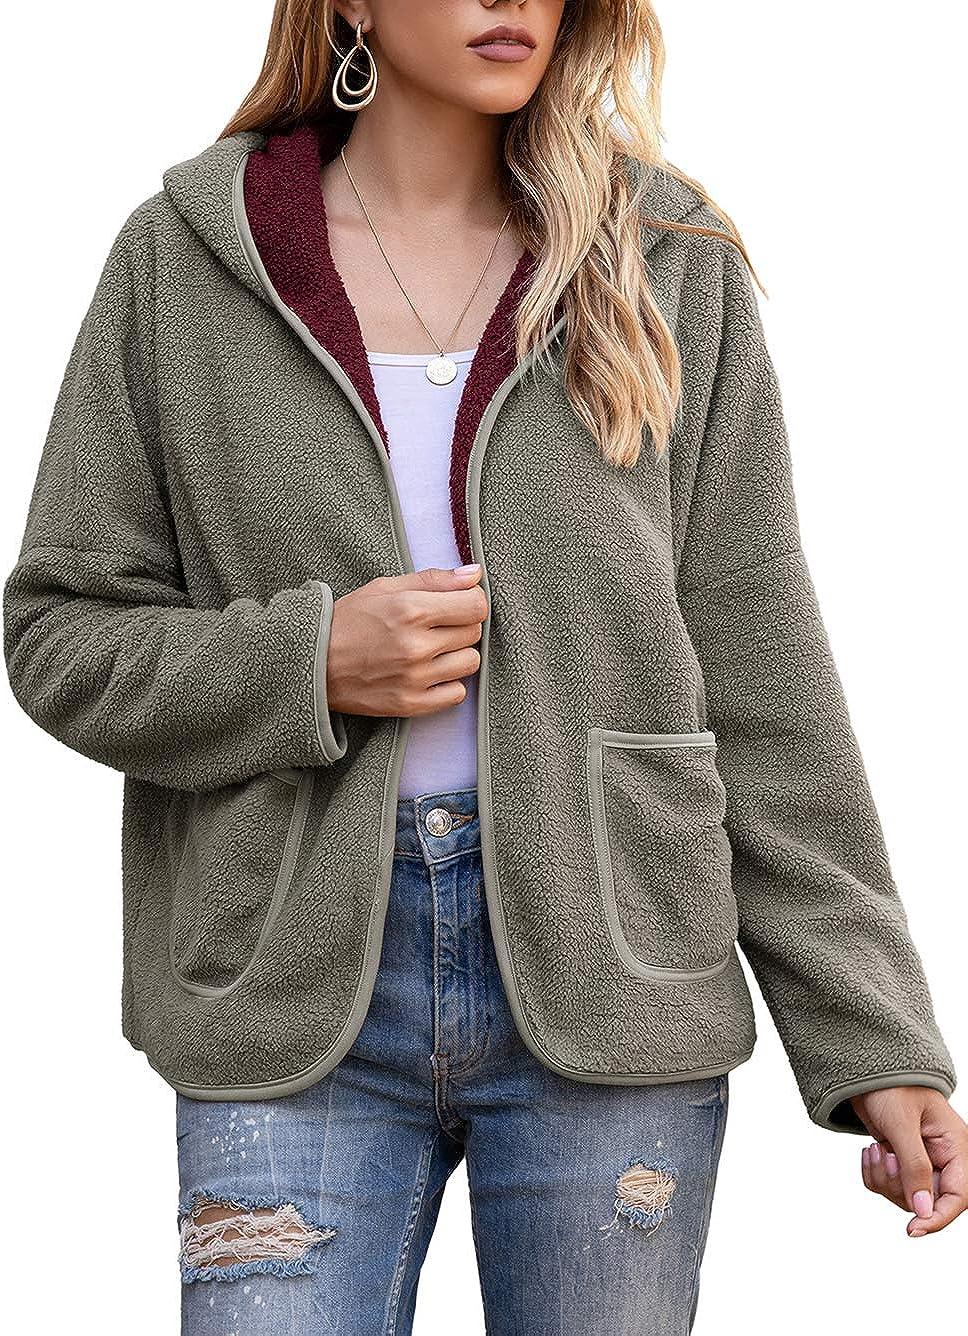 Bunanphy Womens Fleece Hoodies Coat Plush Jacket with Pockets Womens Winter Coats